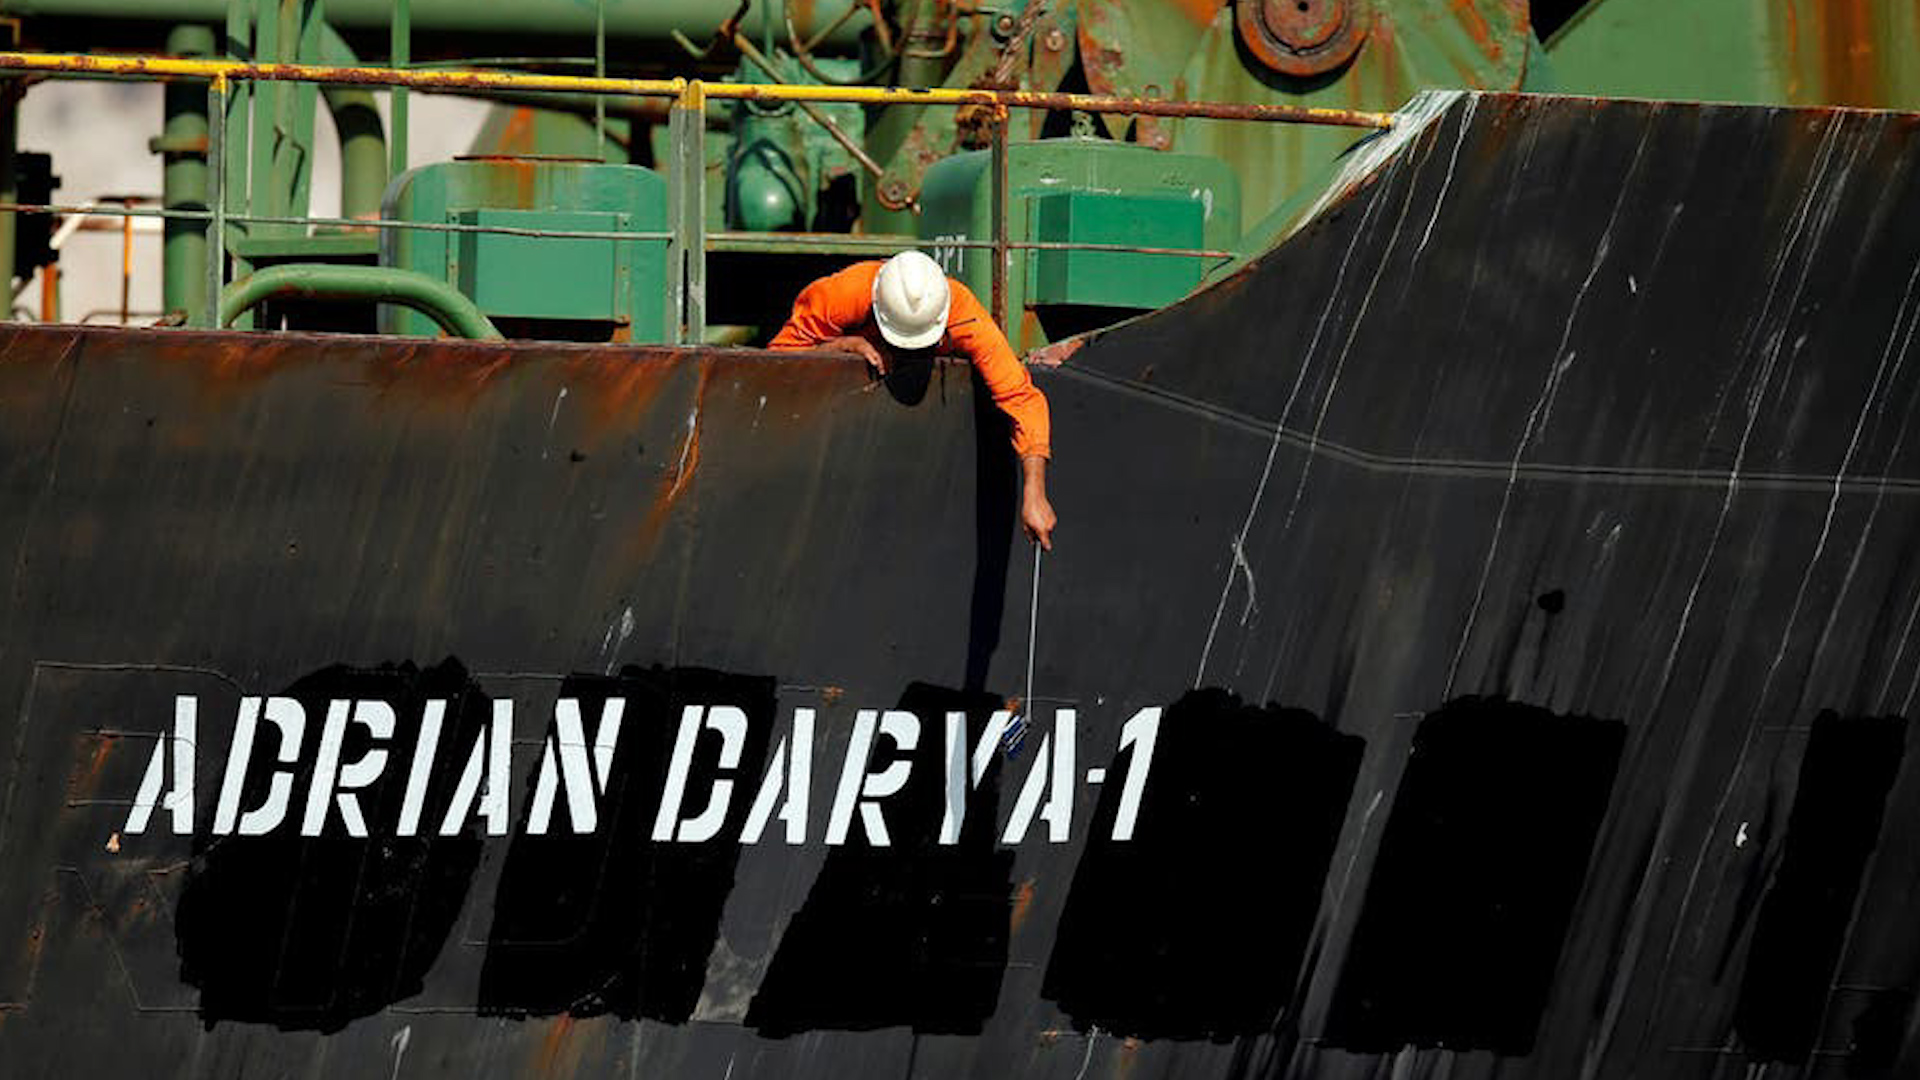 Photo of ناقلة النفط الإيرانية أدريان داريا تفرغ حمولتها في ميناء مرسين بتركيا بعد الإفراج عنها